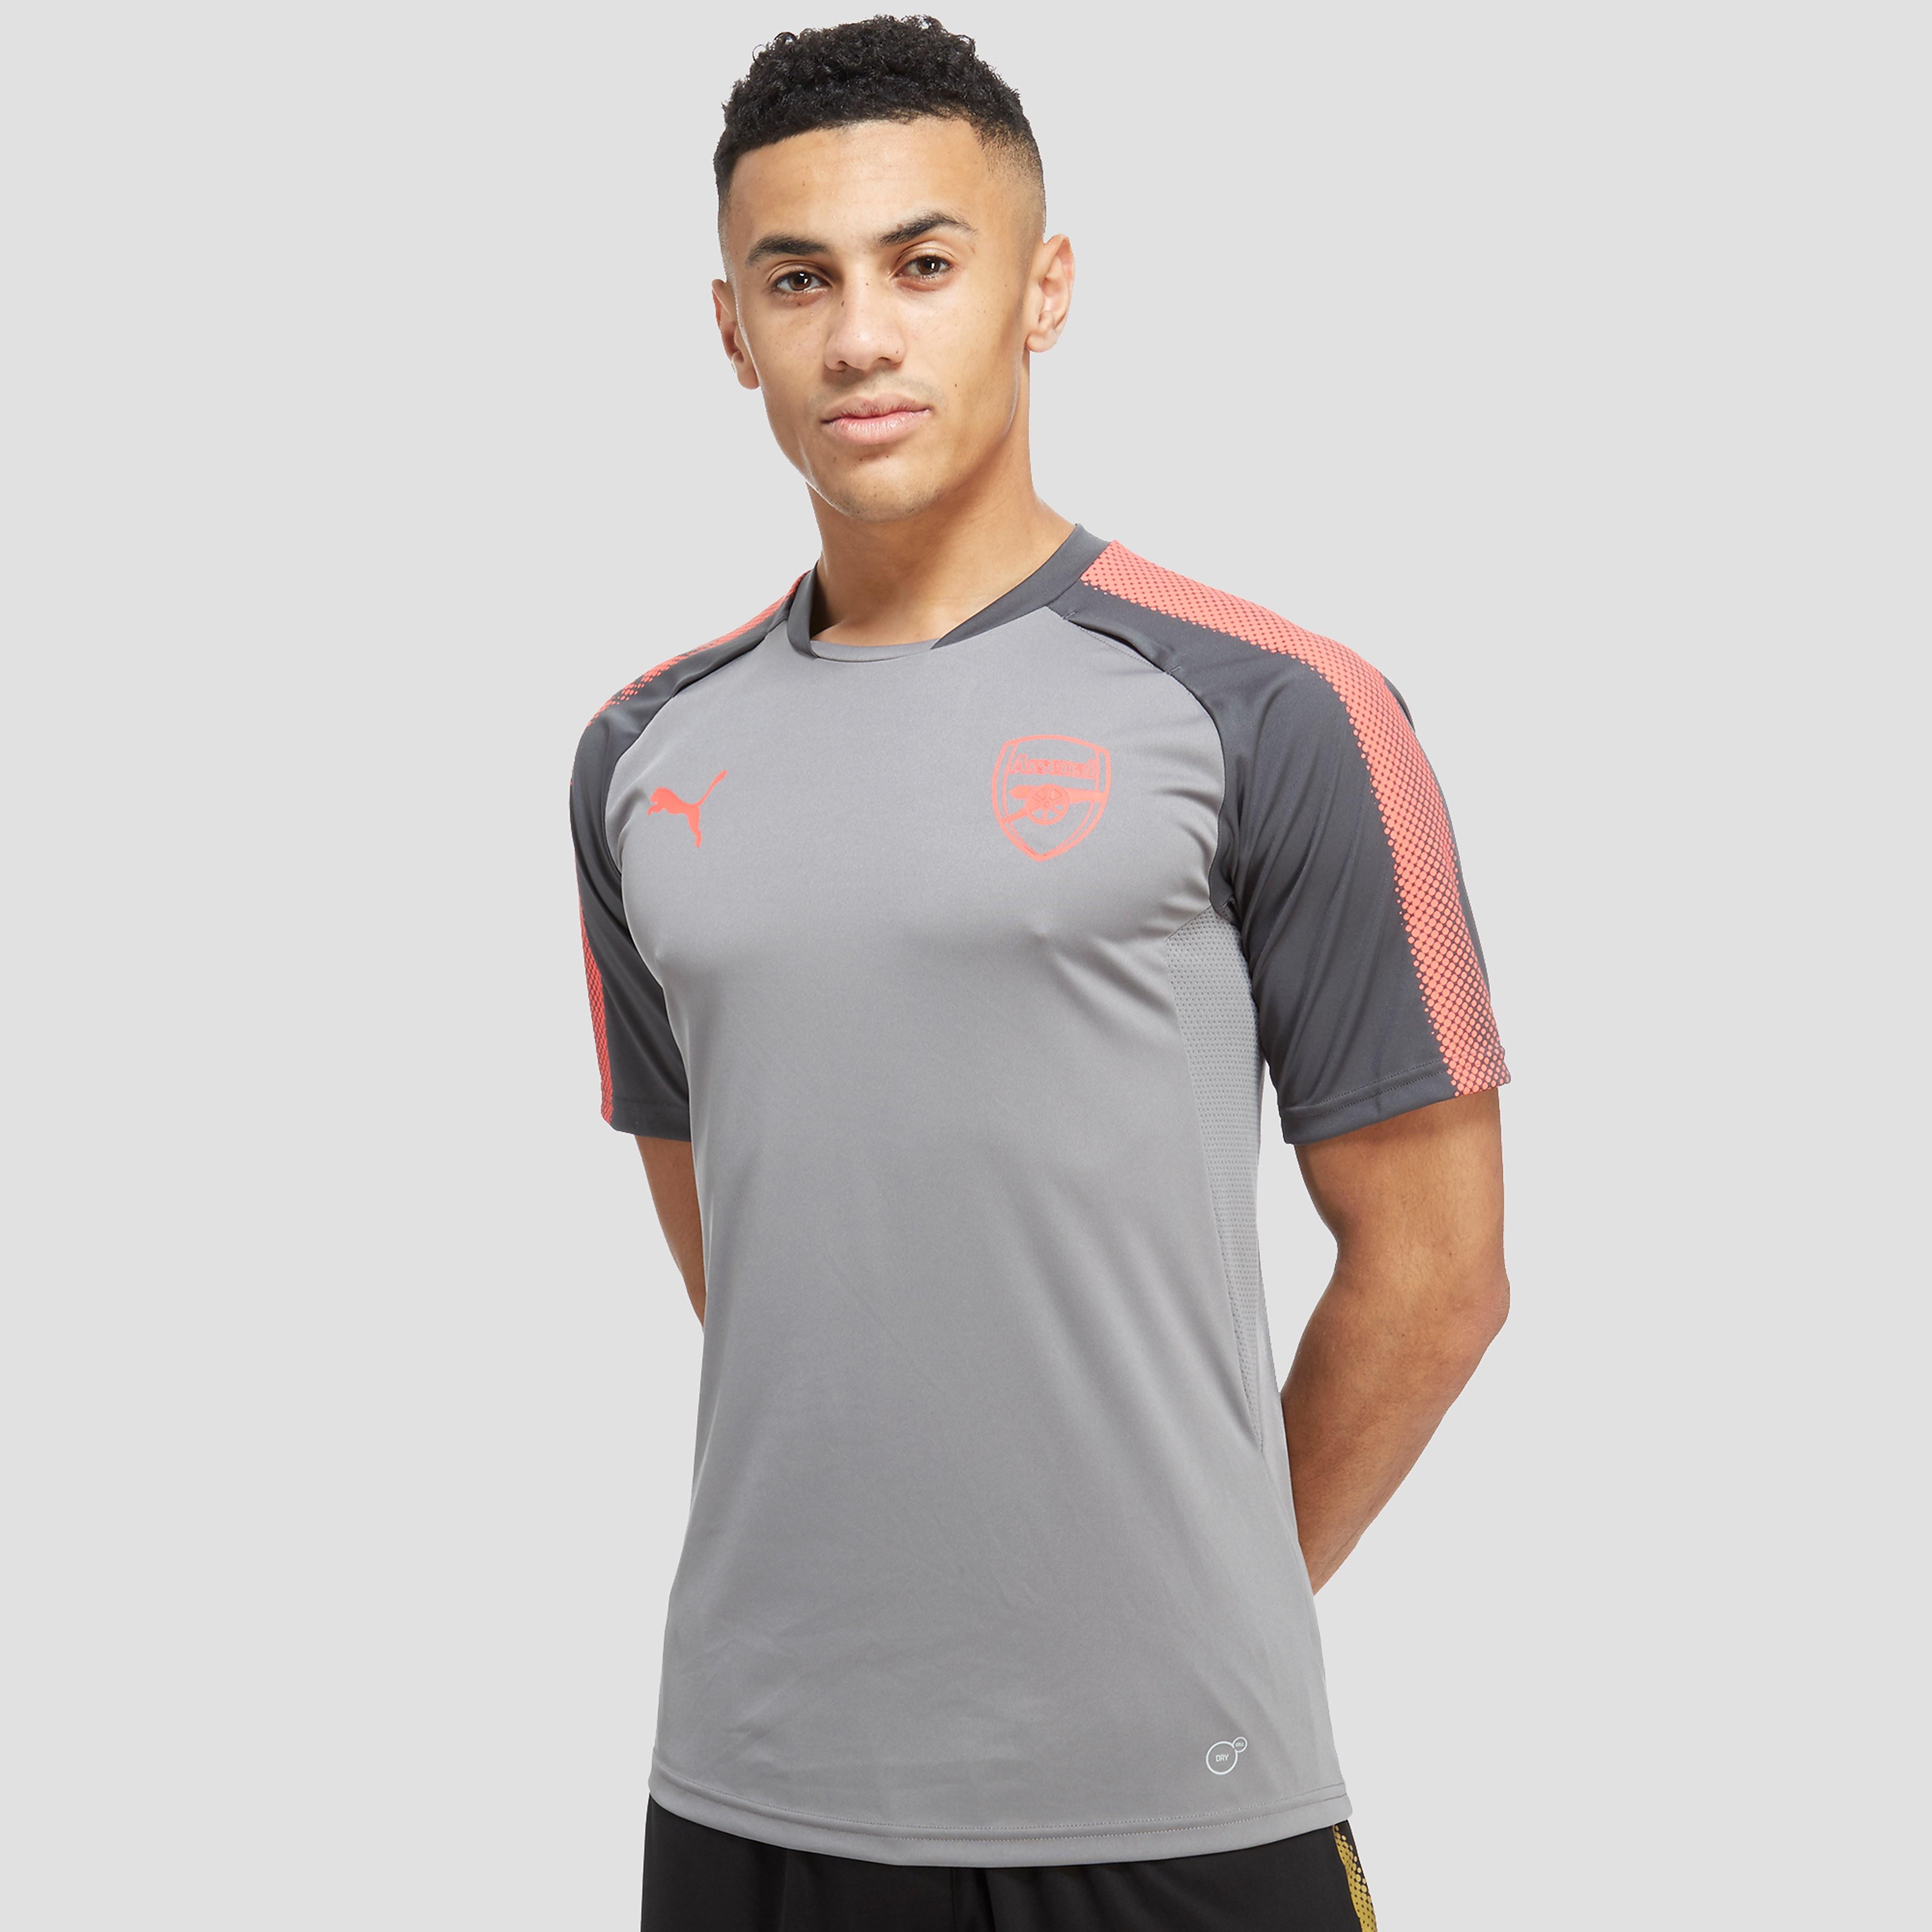 PUMA Arsenal 2017 Training Shirt